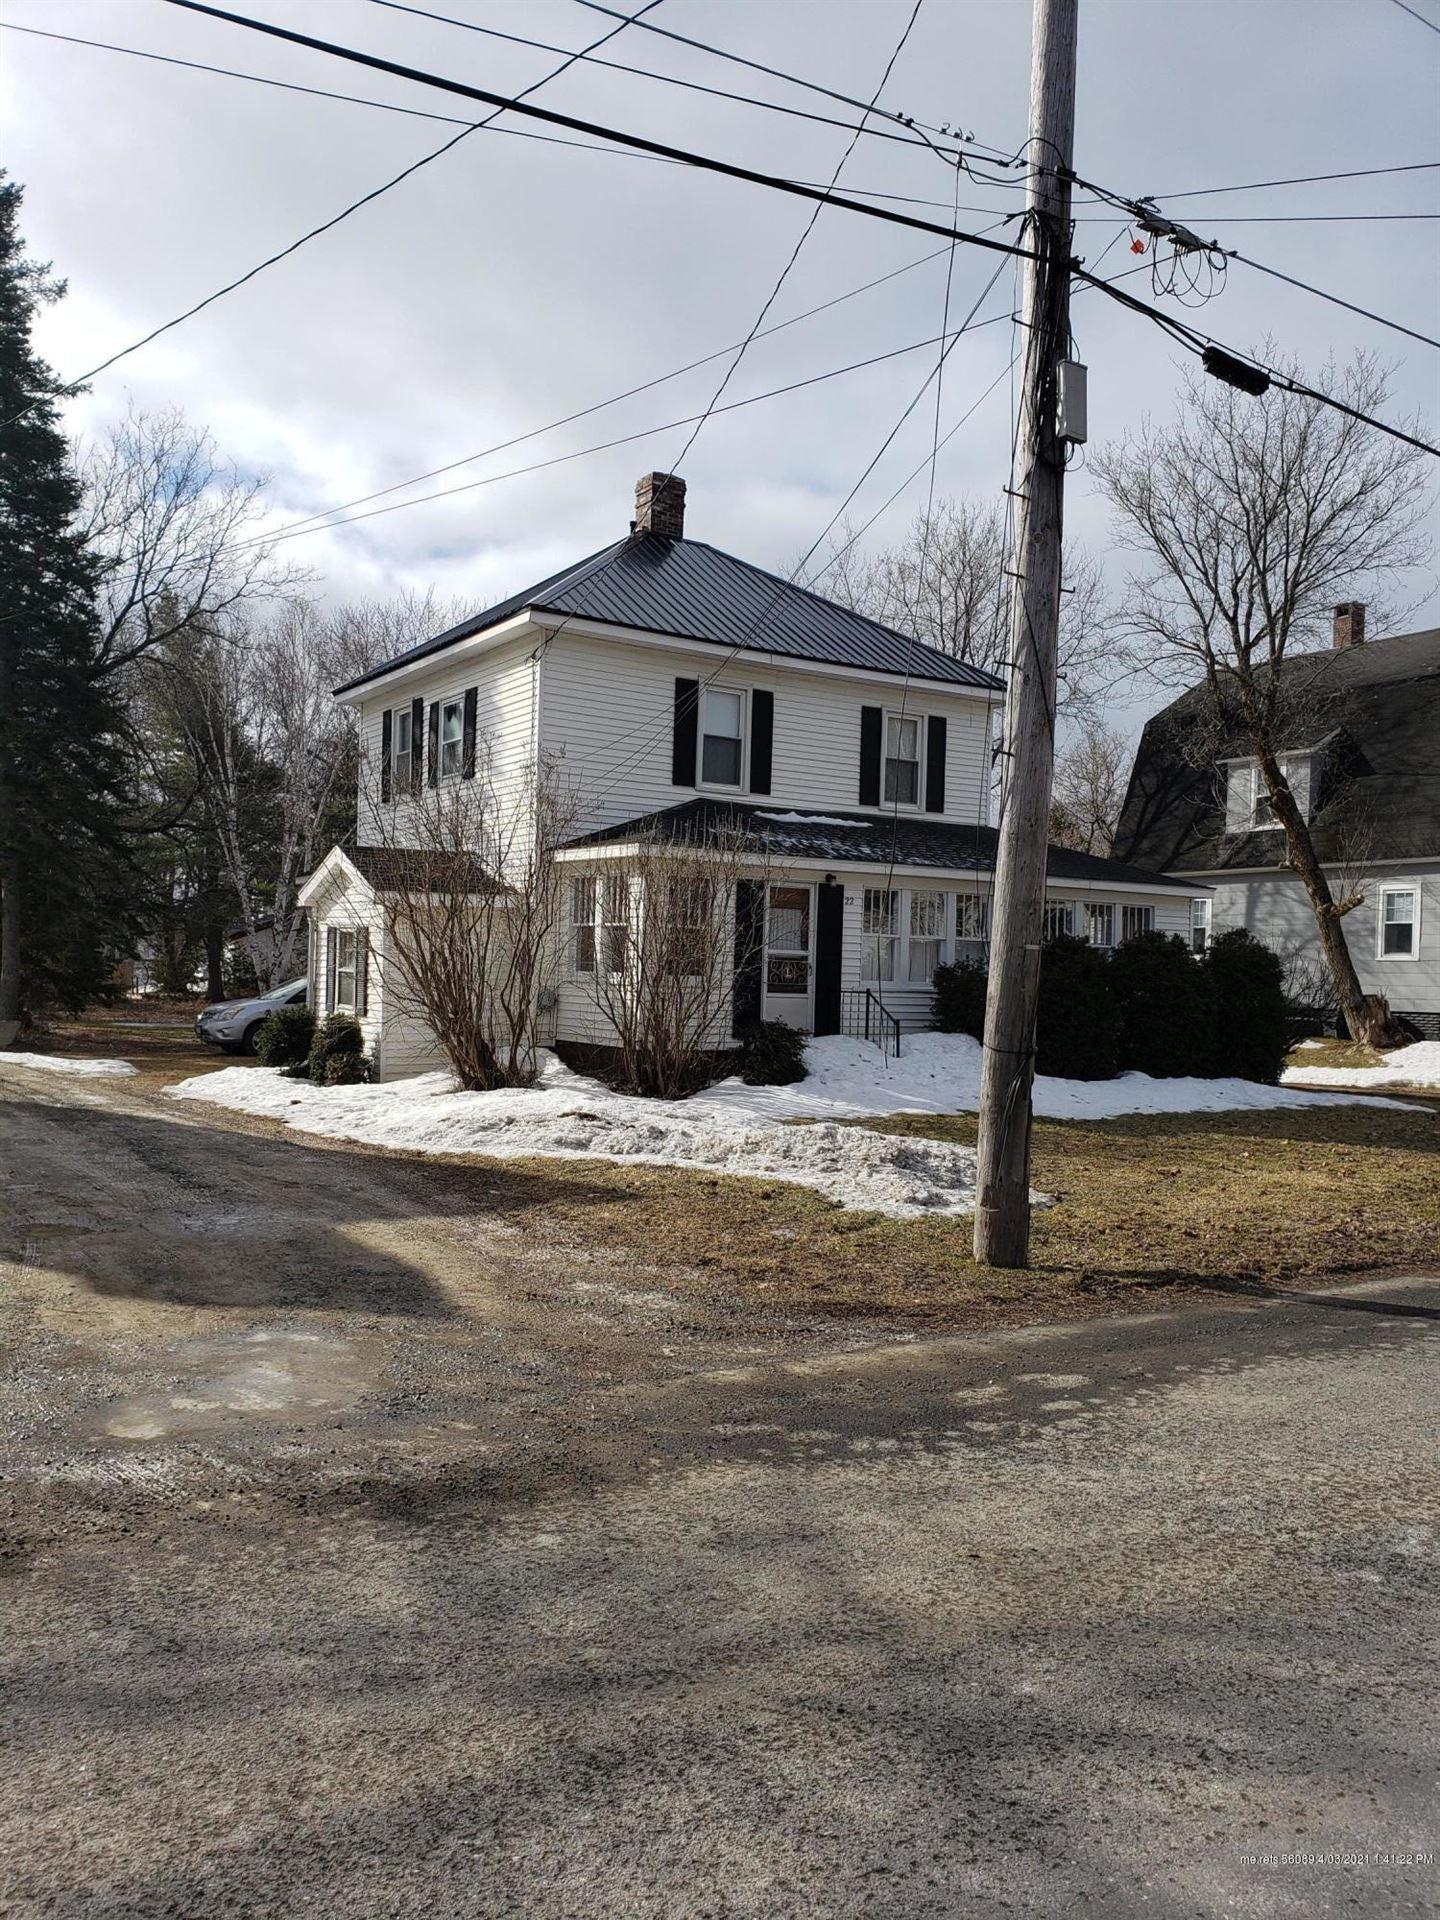 Photo of 22 Turner Street, Presque Isle, ME 04769 (MLS # 1486404)